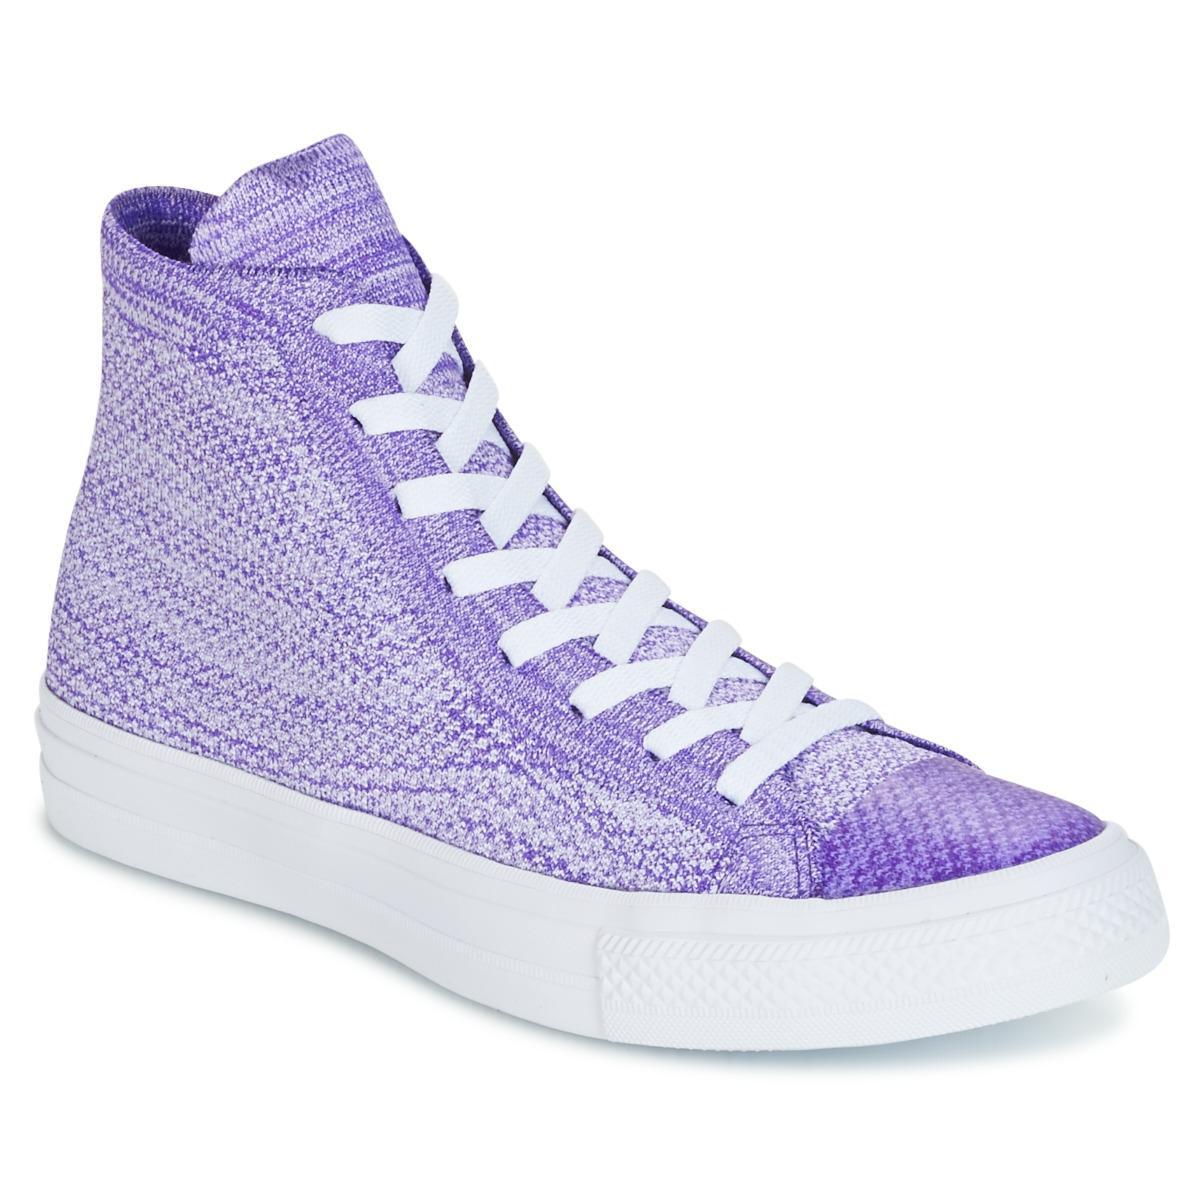 quality design 85d3a e6ea2 ... discount code for converse. mens purple chuck taylor all star nike  flyknit 3e4b2 cc2c9